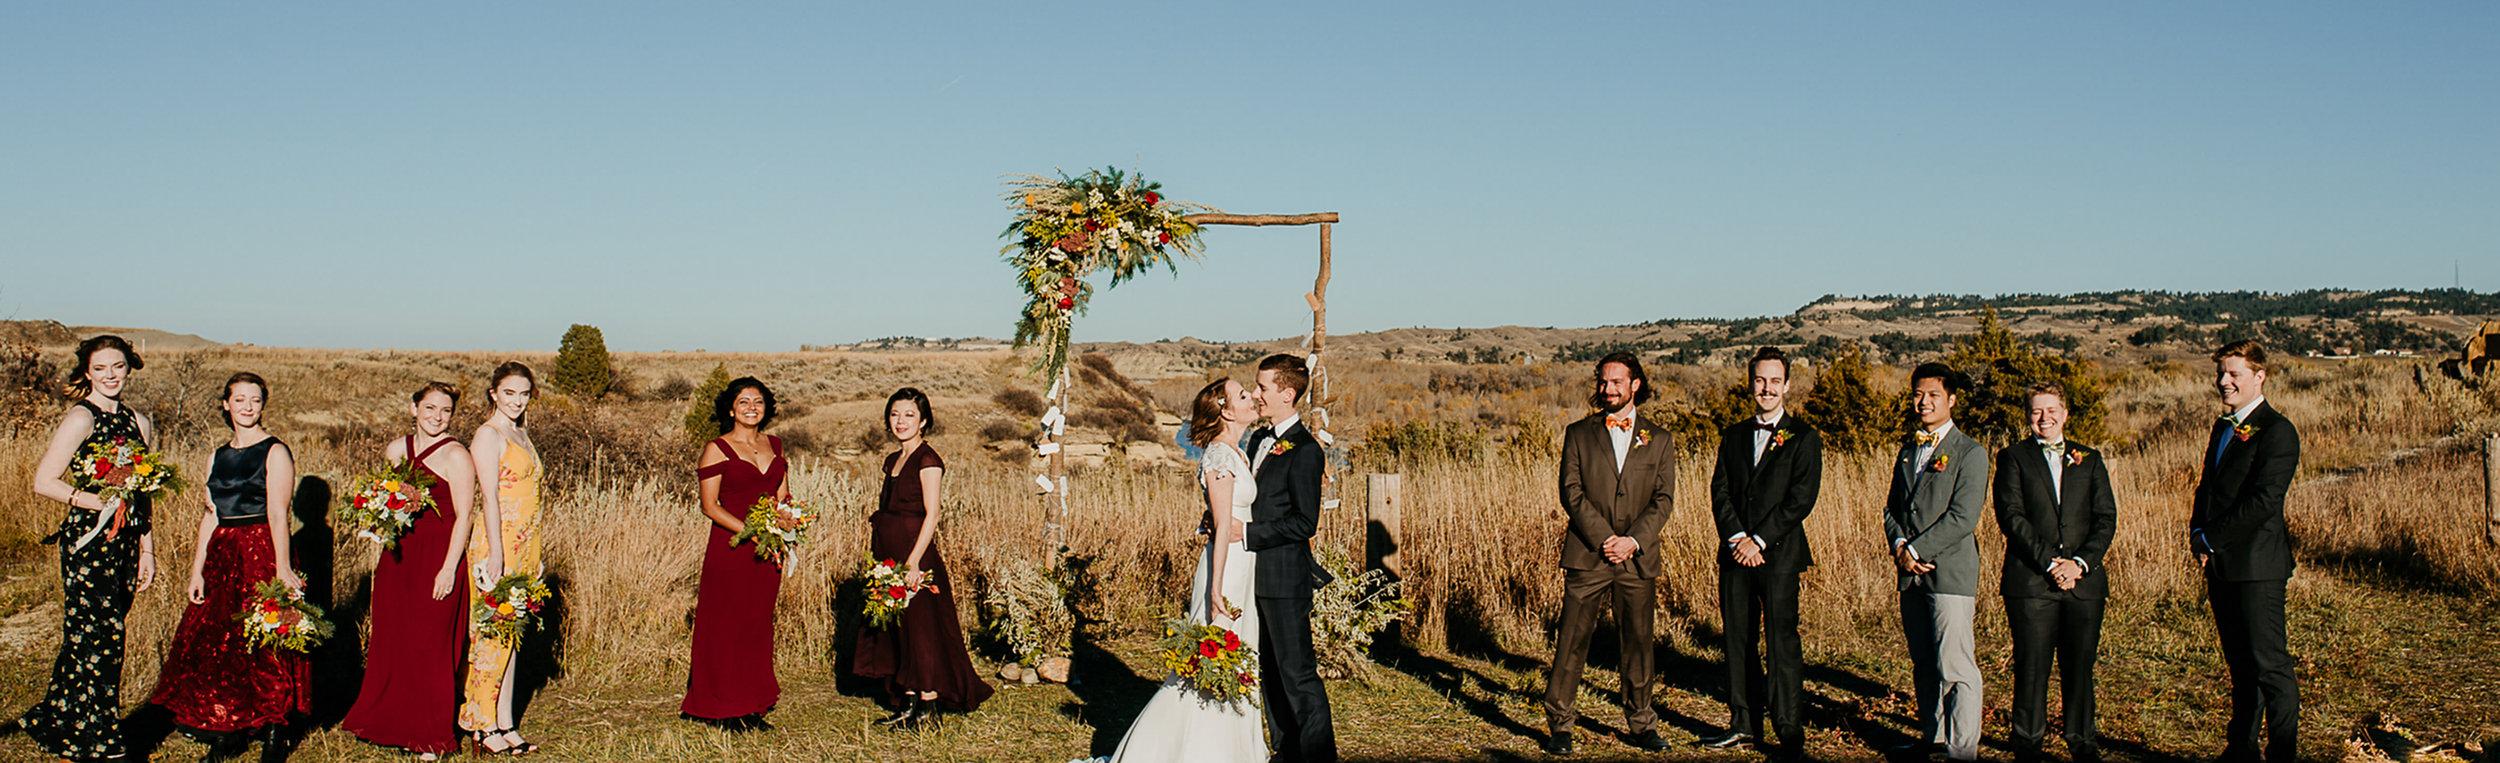 0764Fall Wedding_Maroon Wedding_Billings Wedding Photographer_Emma + Dan_October 20, 2018-3954 copy.jpg